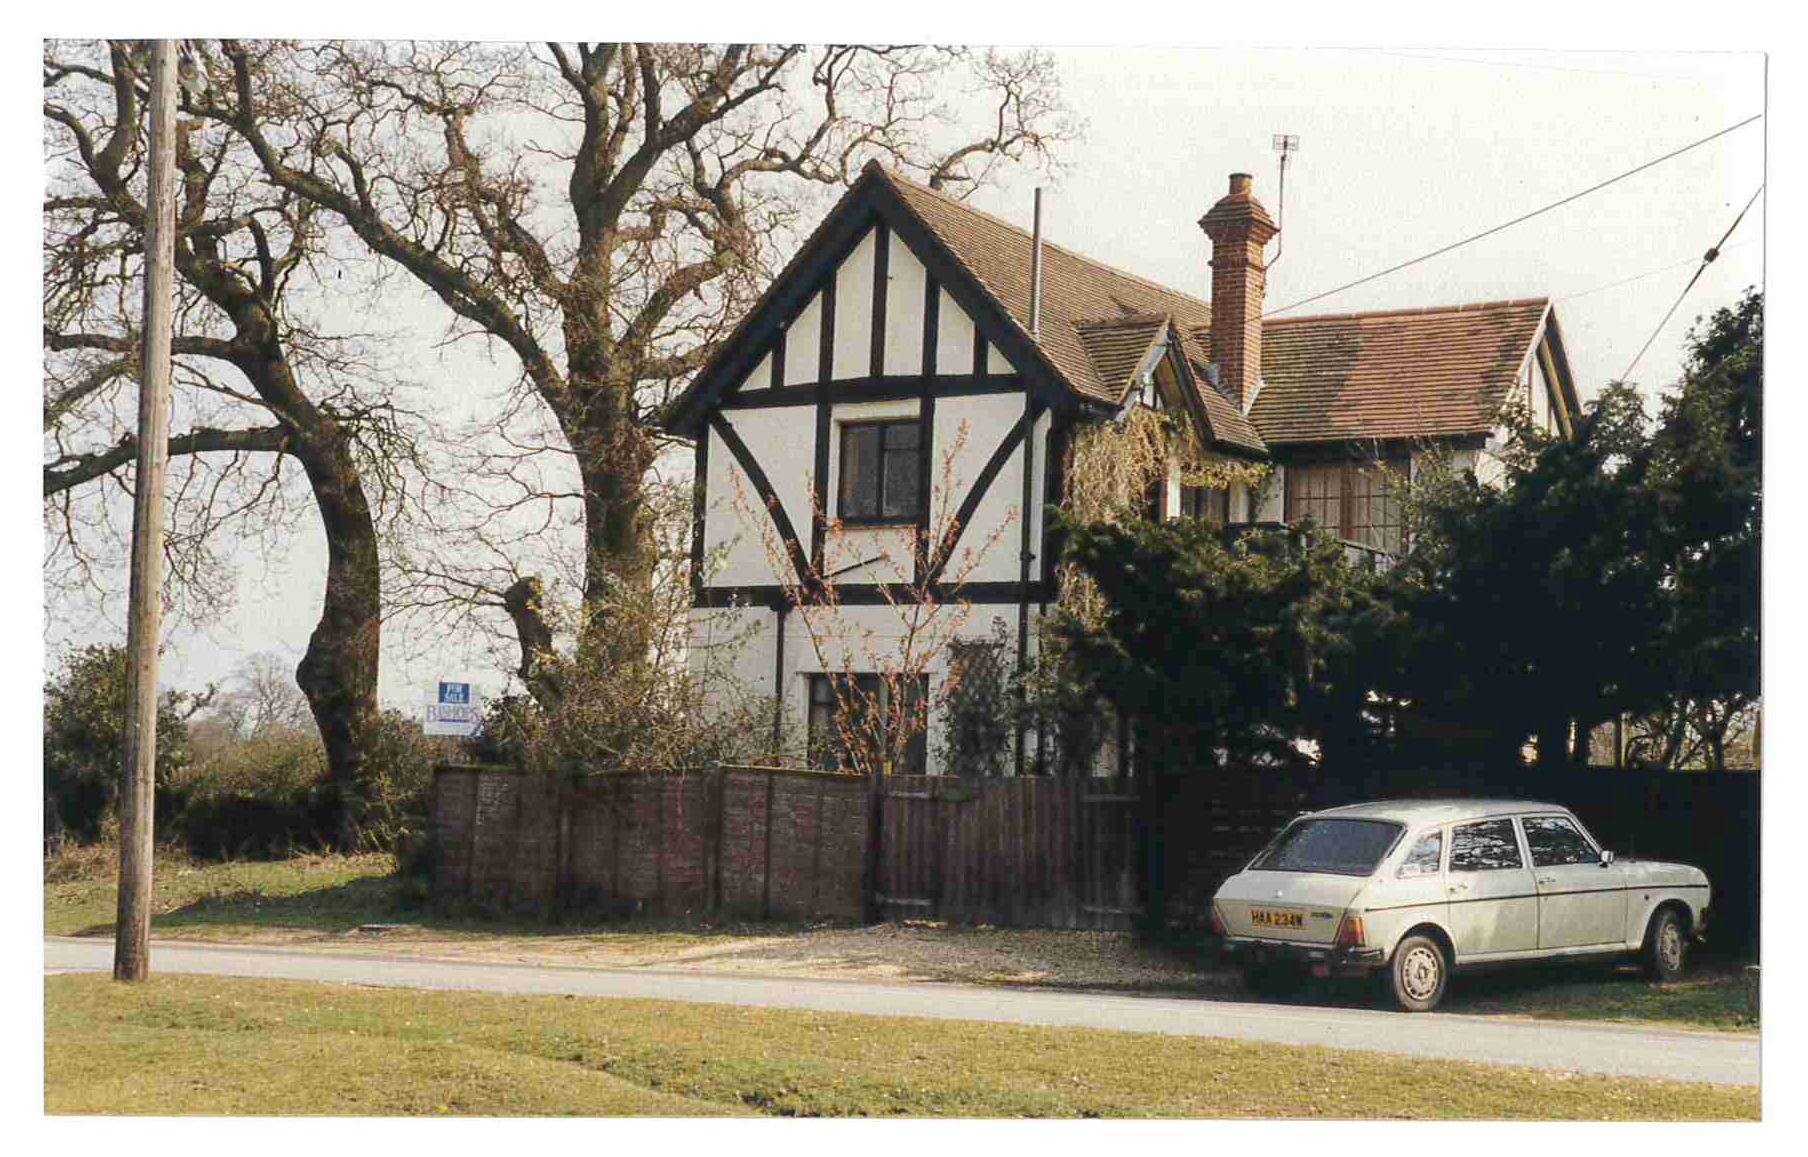 The Forest Toys factory, Burley Road, Brockenhurst c. 1989